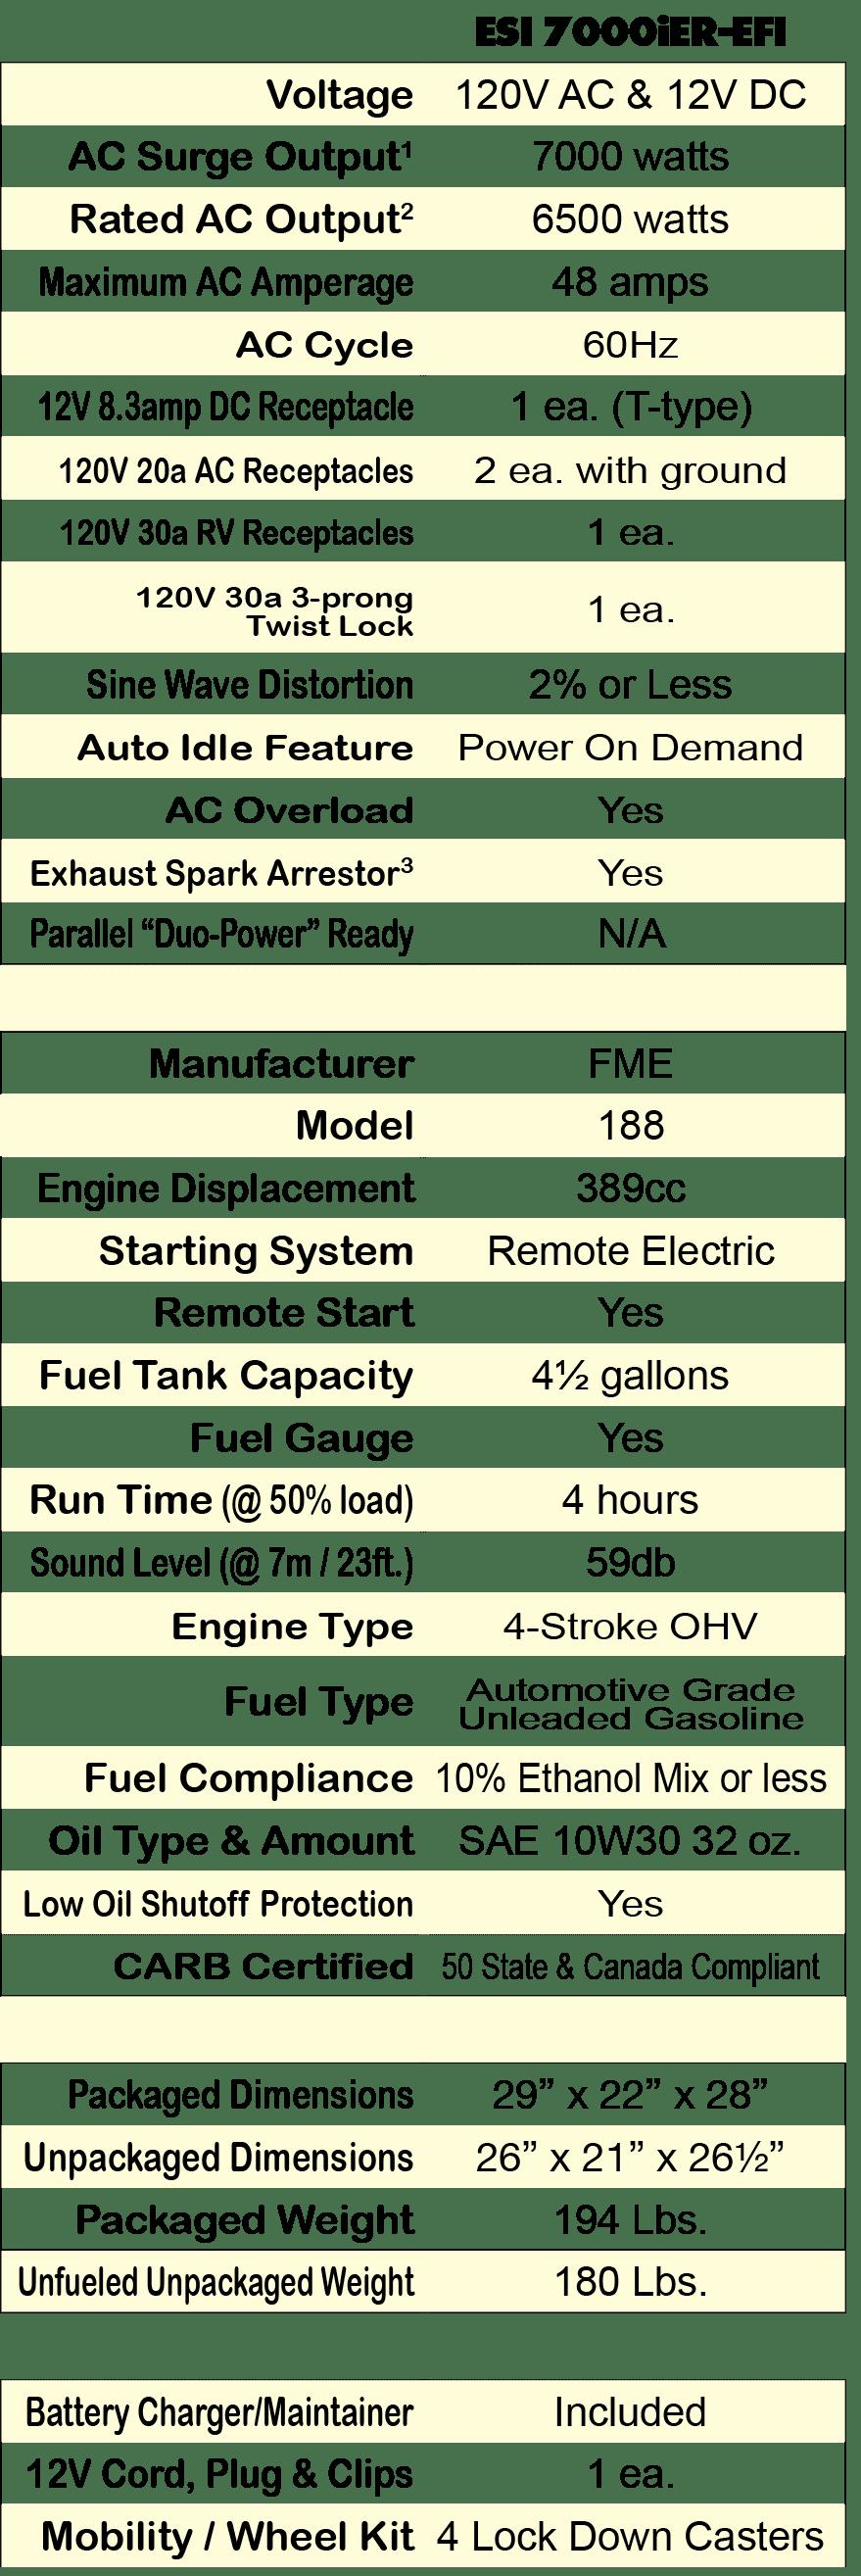 ESI7000iER-EFI